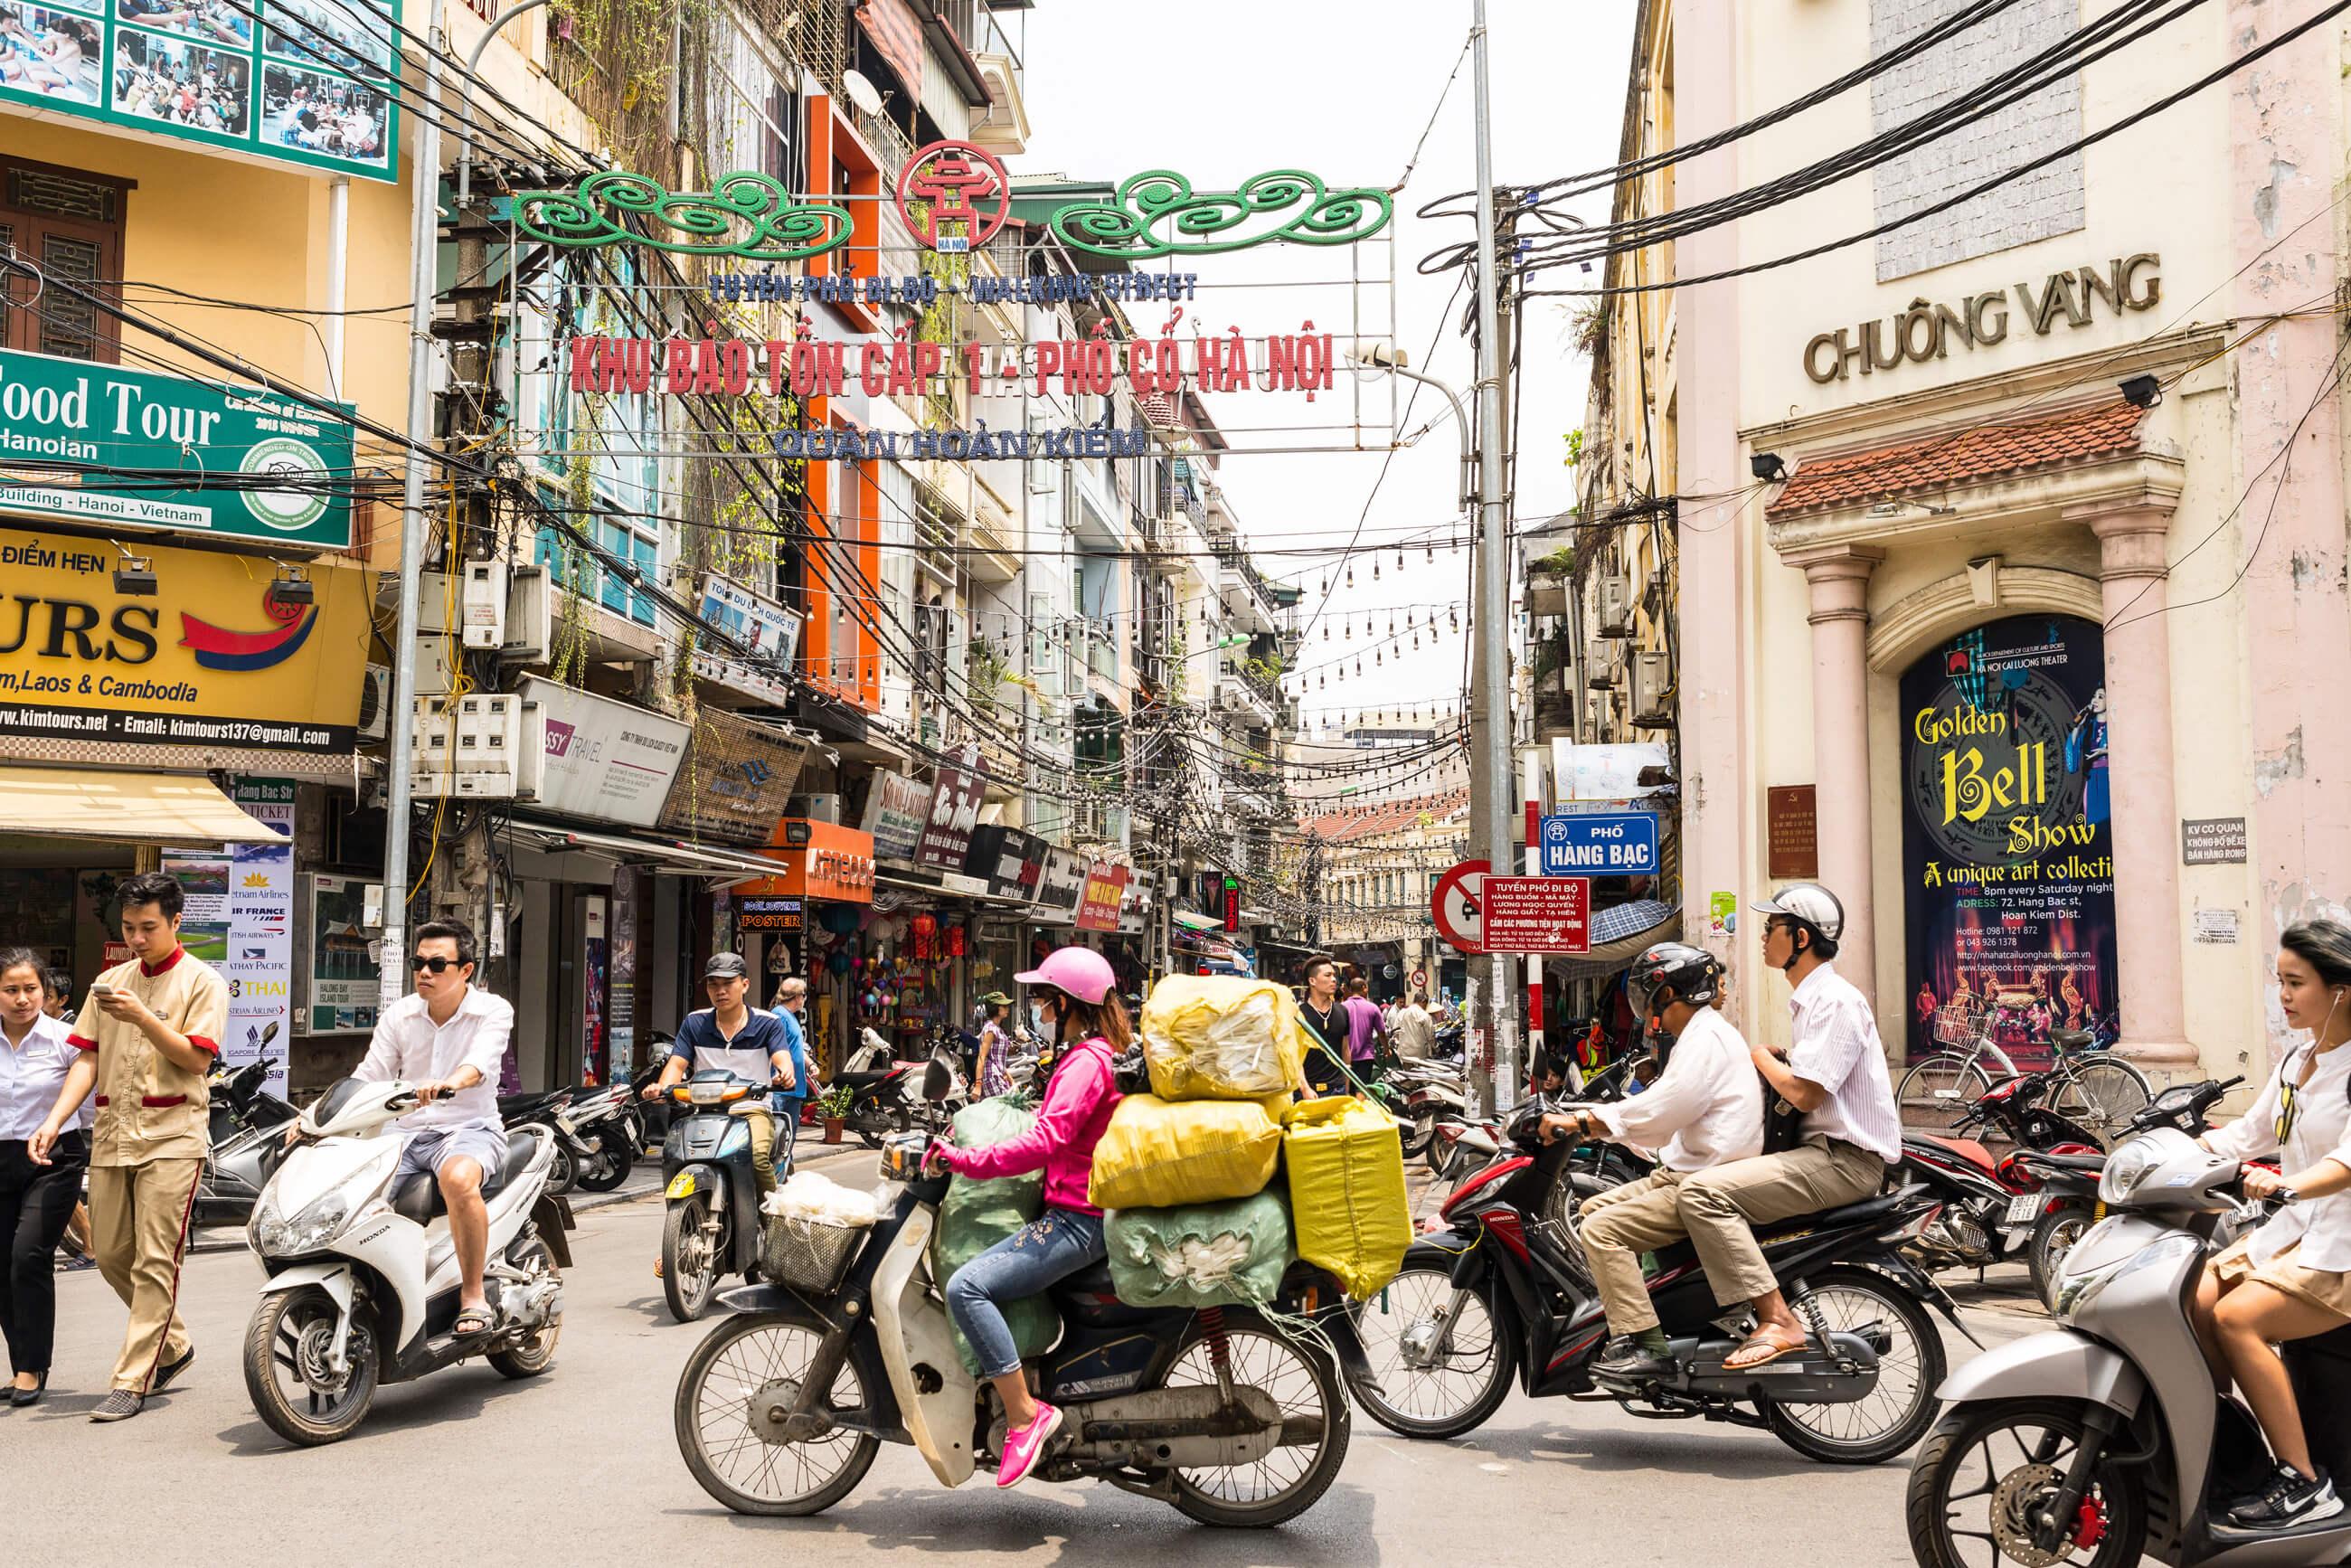 https://bubo.sk/uploads/galleries/4915/shutterstock_vietnam_hanoj_432633577-1-.jpg